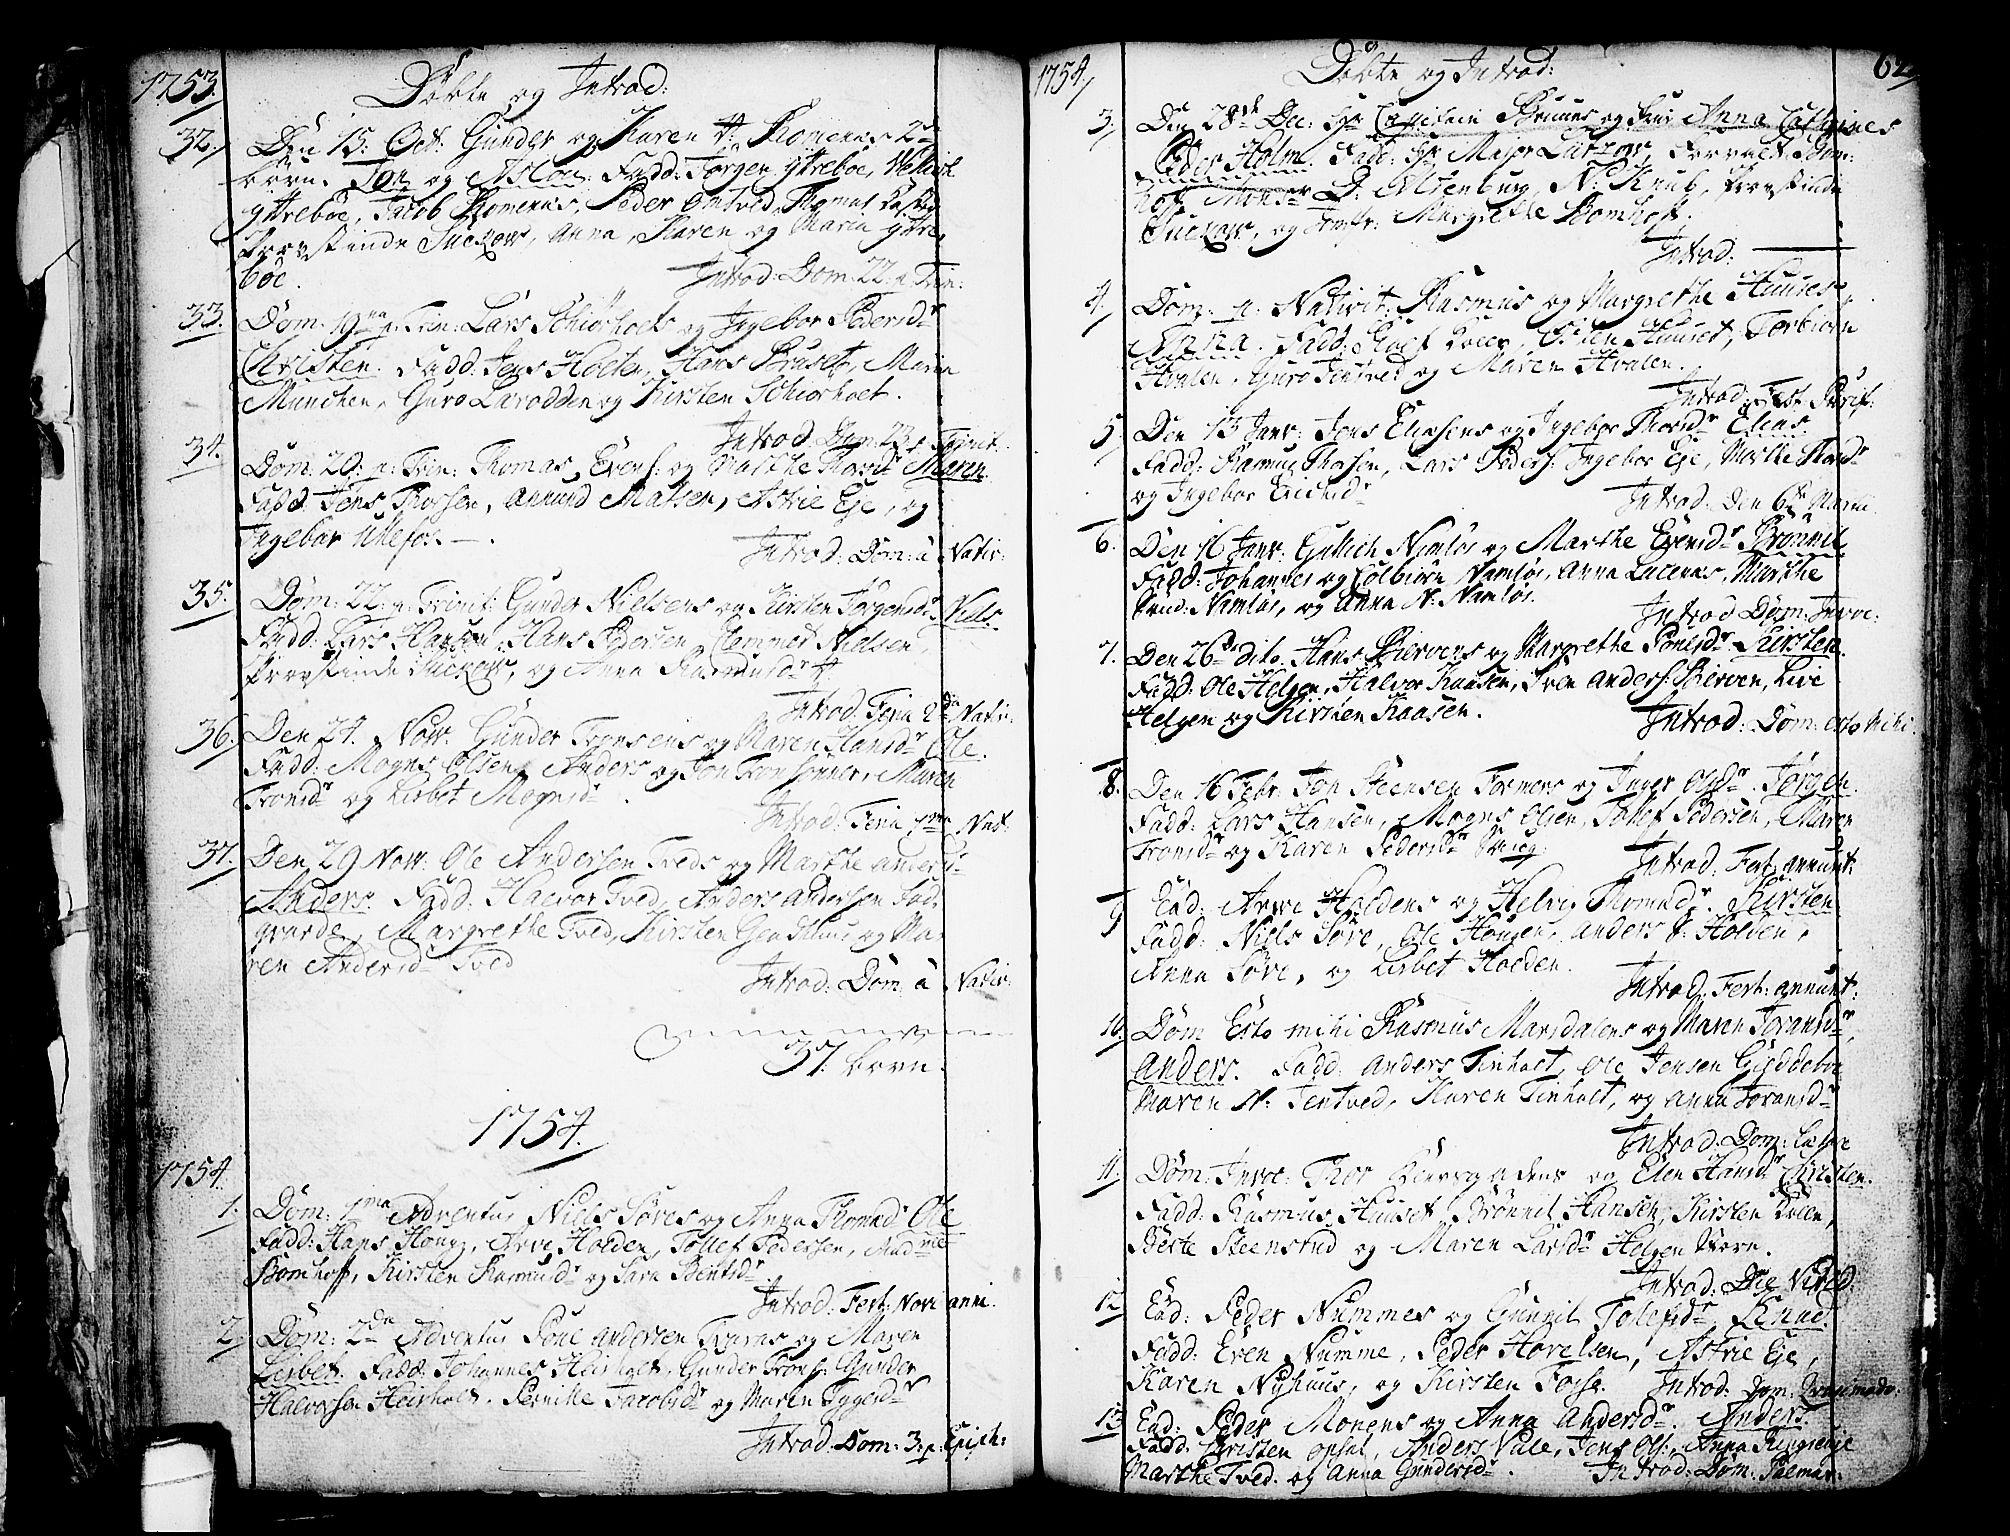 SAKO, Holla kirkebøker, F/Fa/L0001: Ministerialbok nr. 1, 1717-1779, s. 62